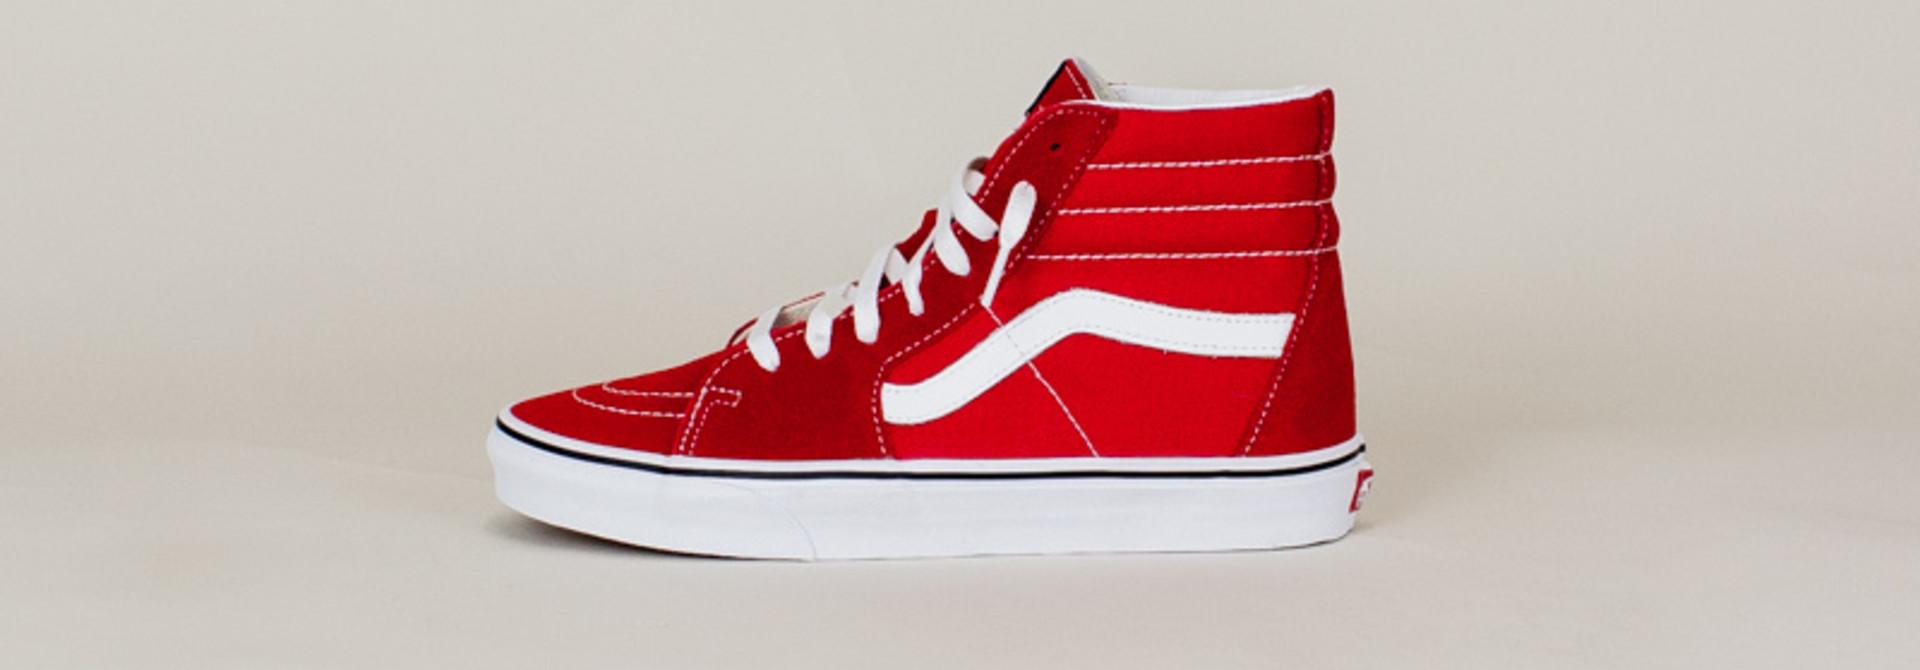 Vans Sk8-Hi - Racing Red/ Tr White